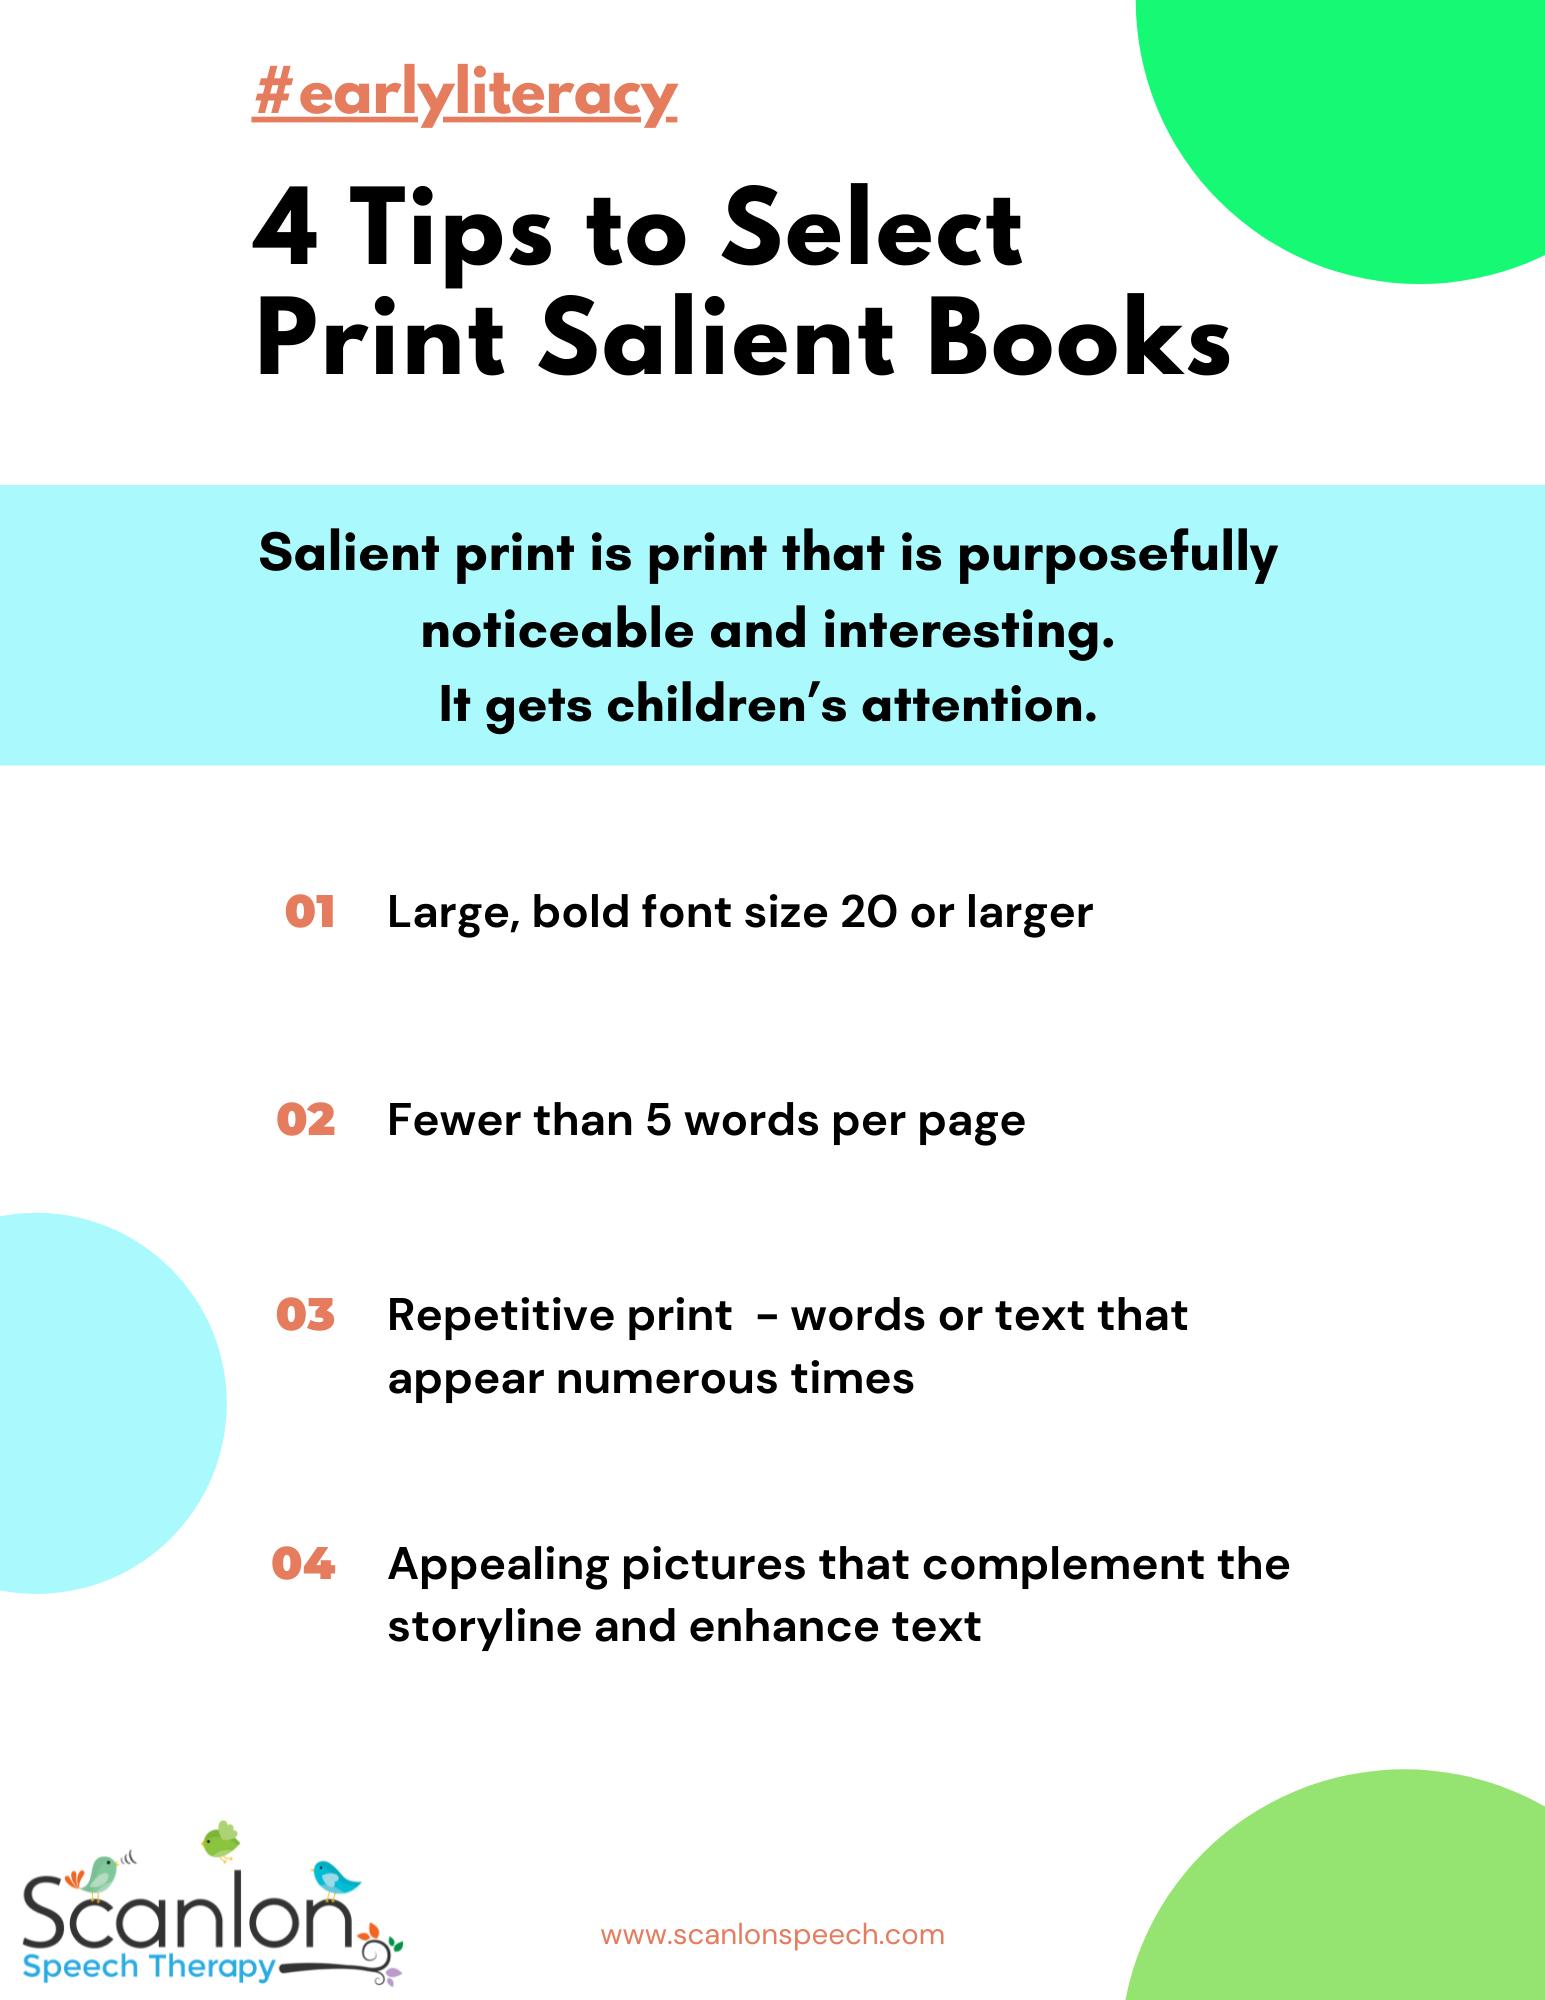 Print salient books